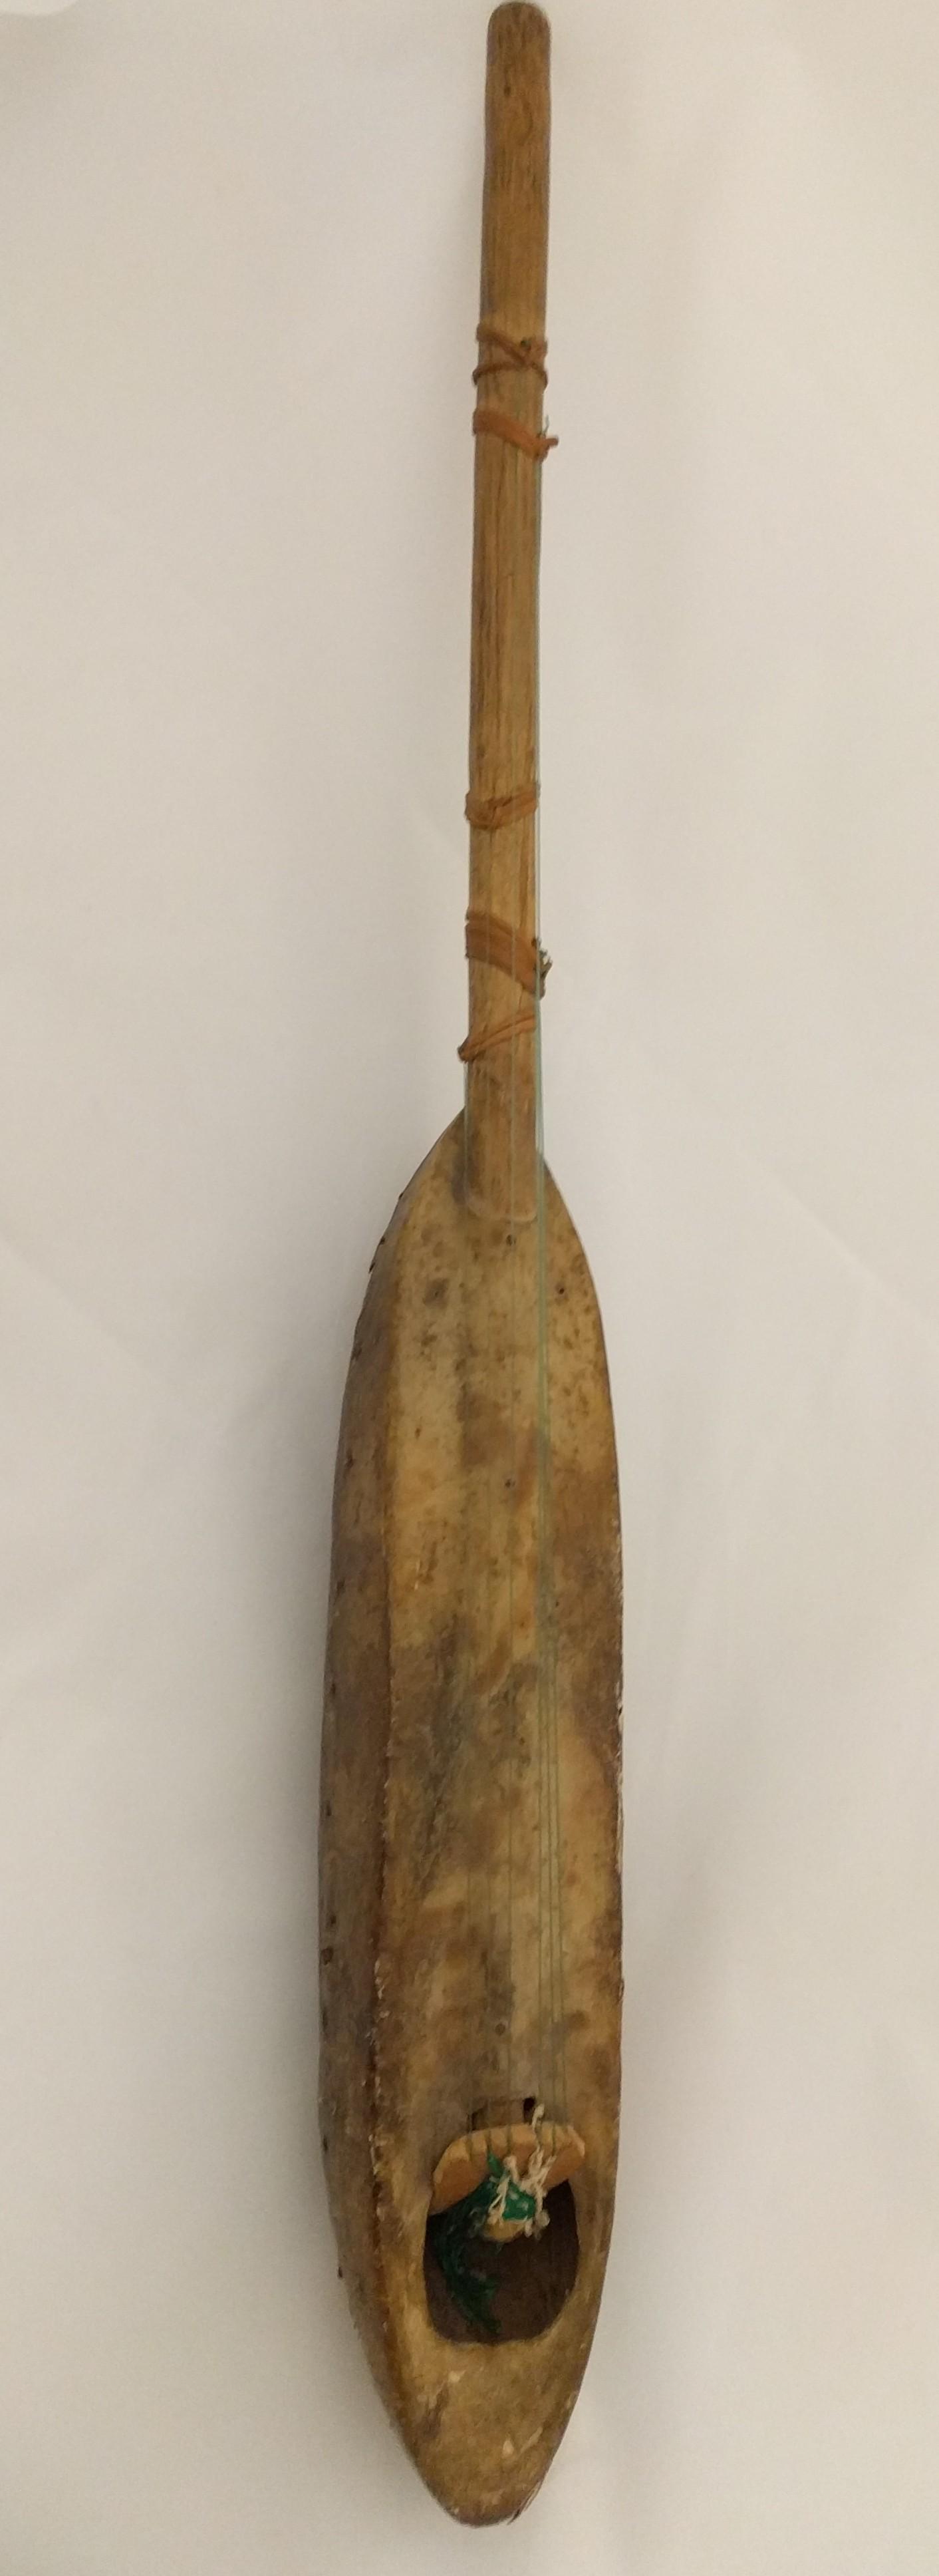 1968.10.0049 (Ngoni) image